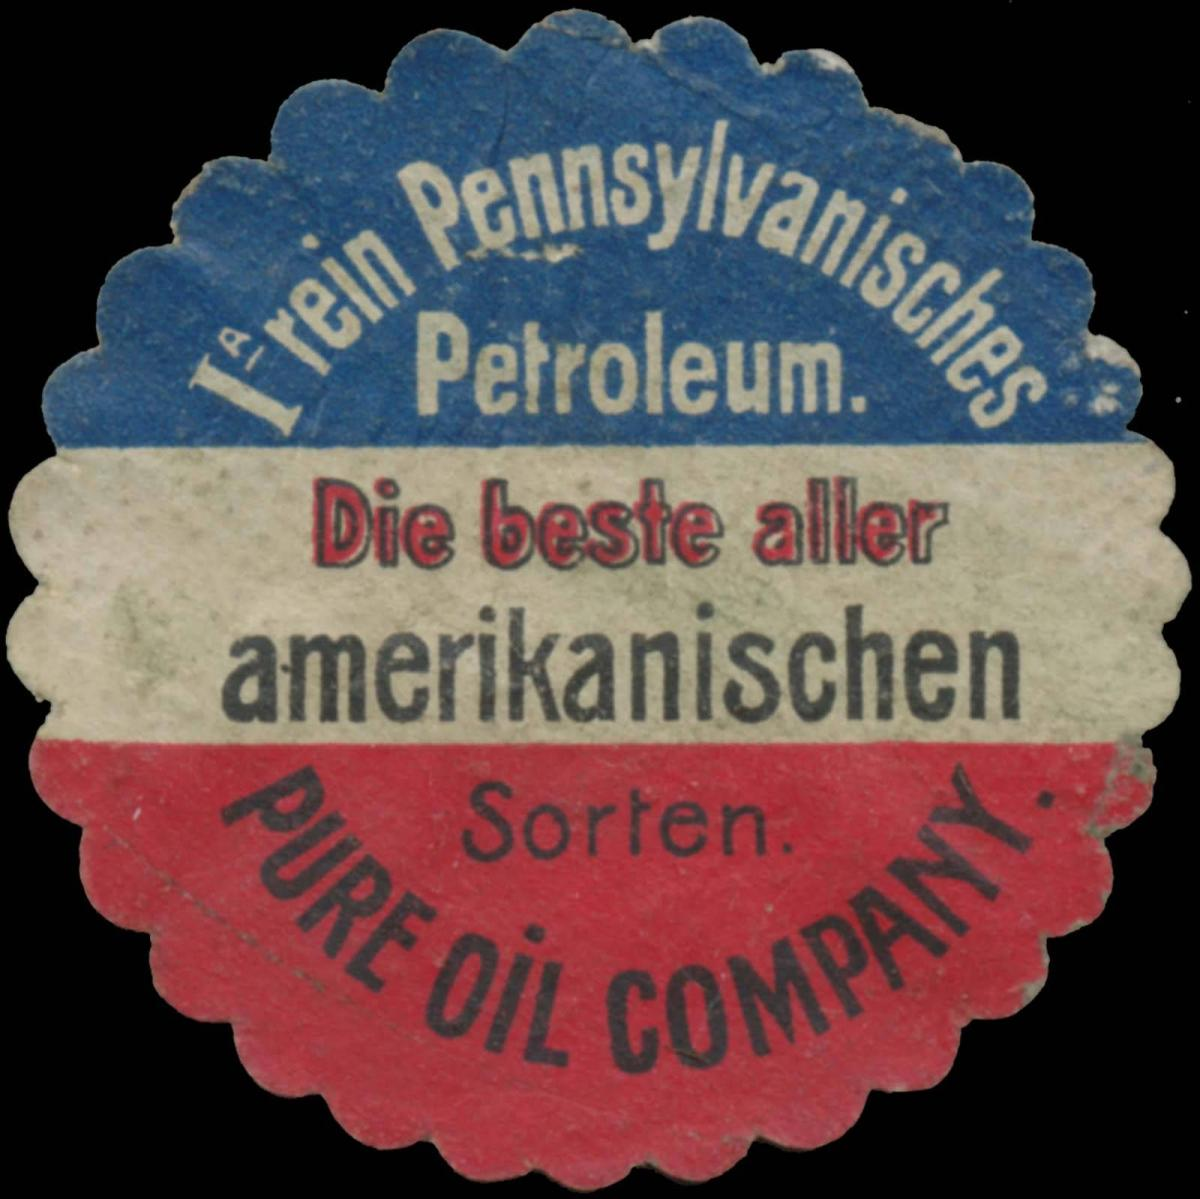 Pennsylvanisches Petroleum